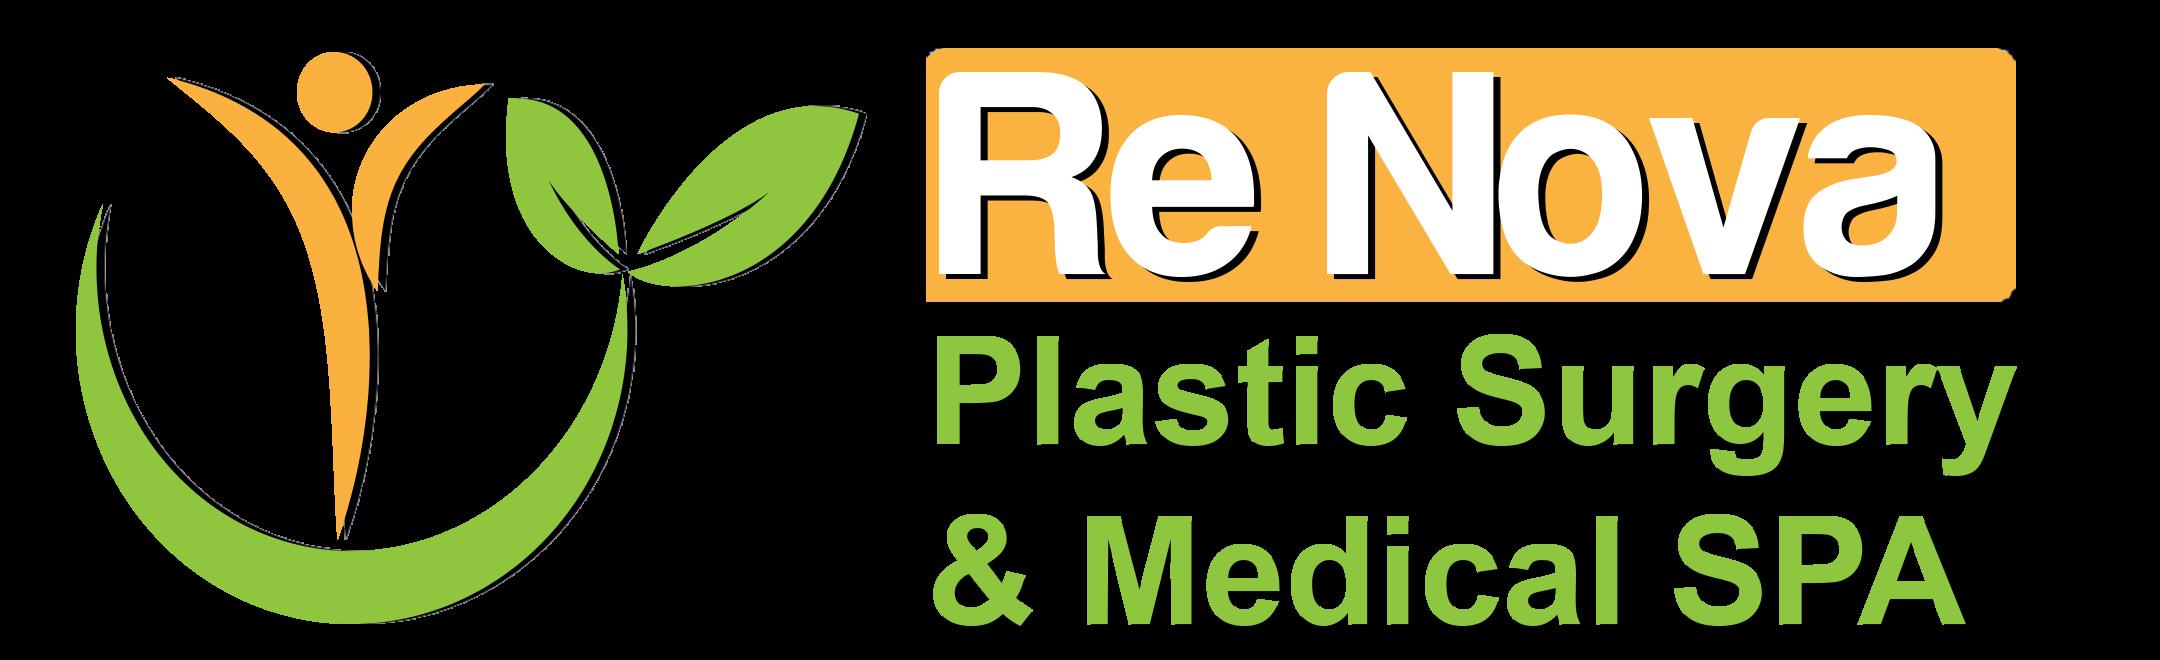 ReNova Plastic Surgery